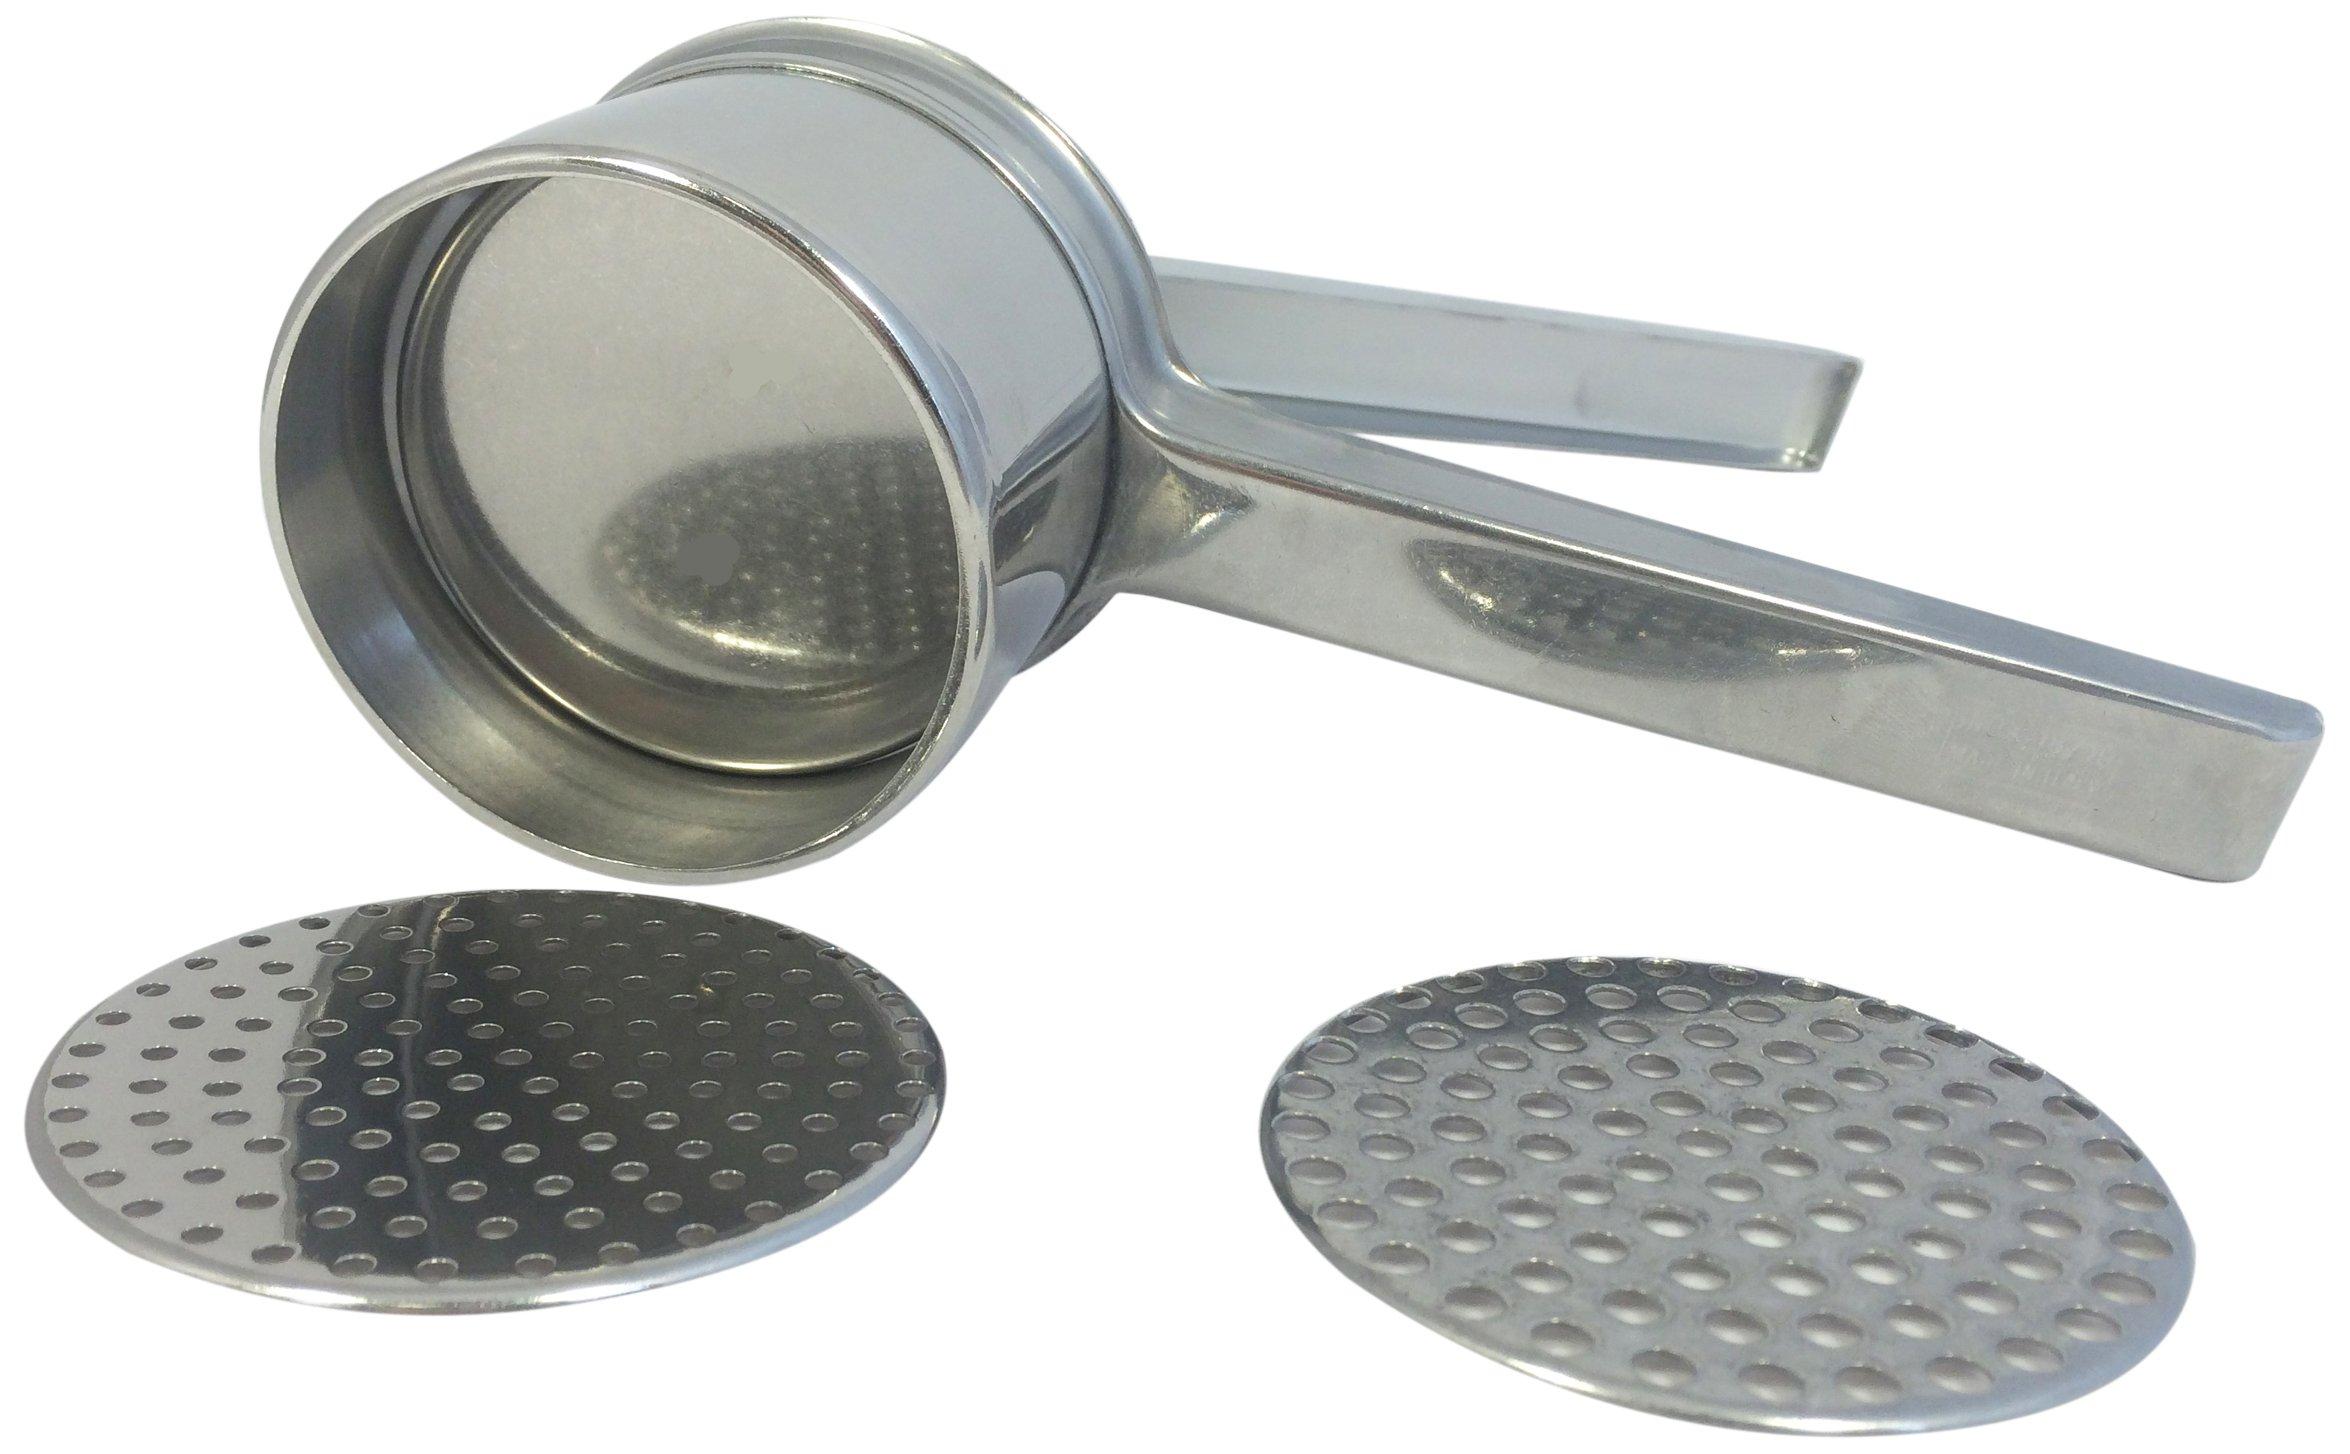 Eppicotispai Stainless Steel Potato Masher/Ricer with 2 Inserts by Eppicotispai